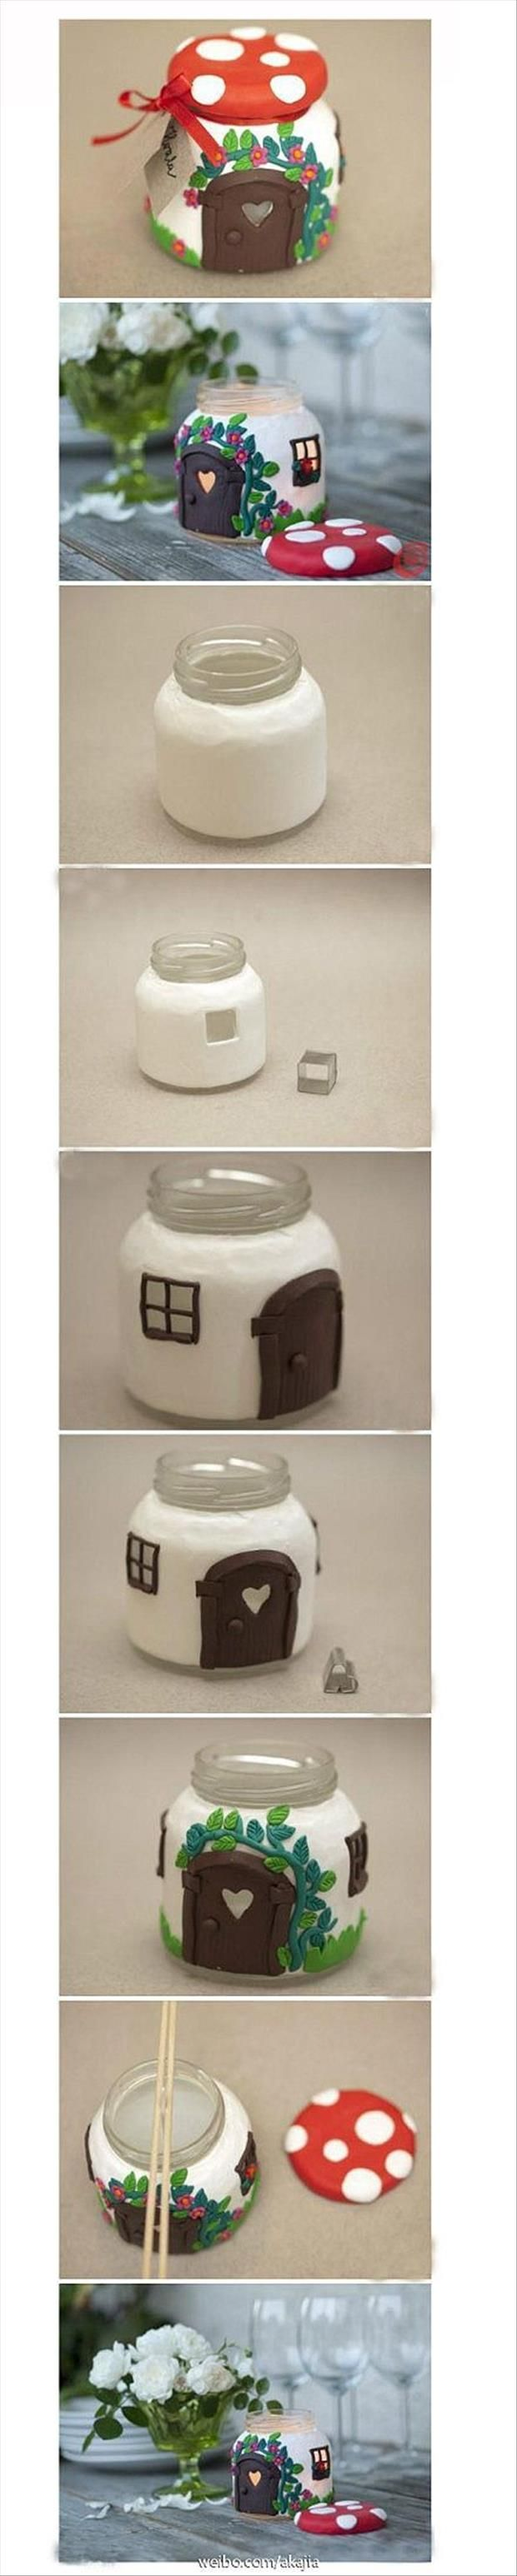 do-it-yourself-craft-ideas-10.jpg 620×3,092 pixels